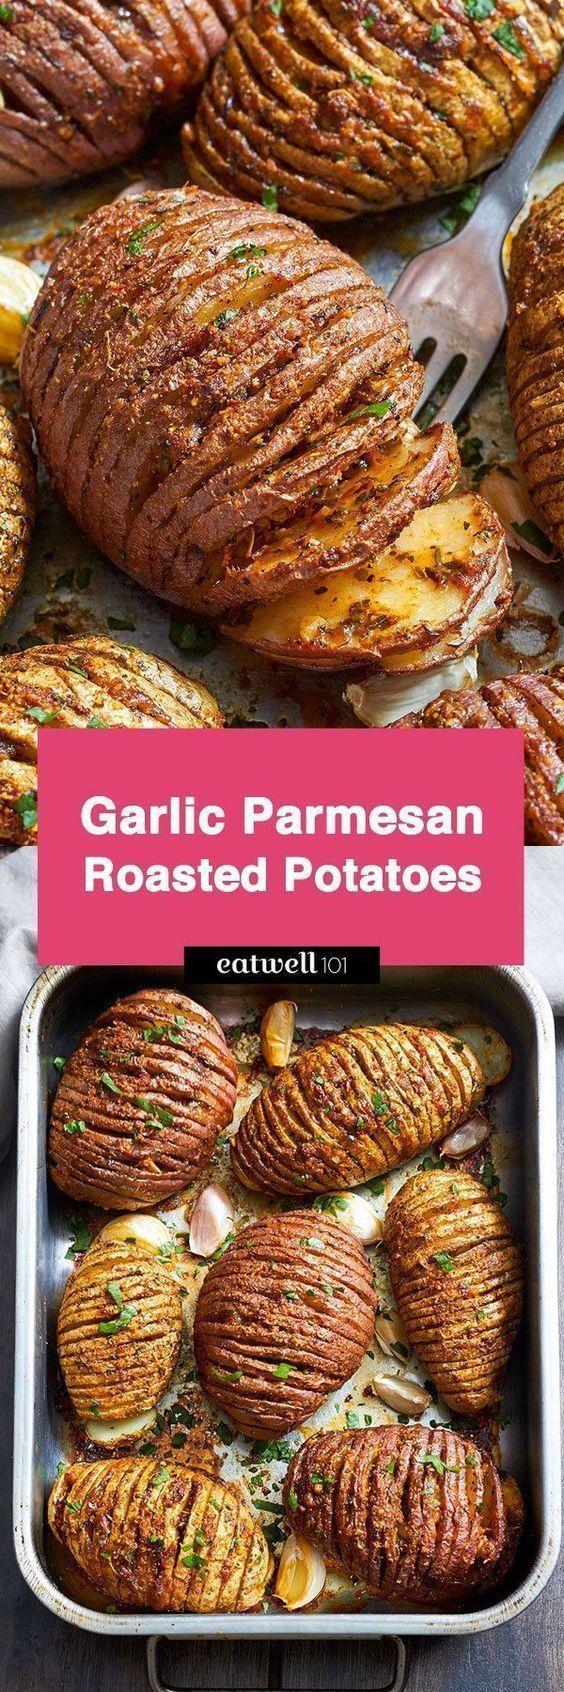 Garlic Parmesan Butter Roasted Potatoes